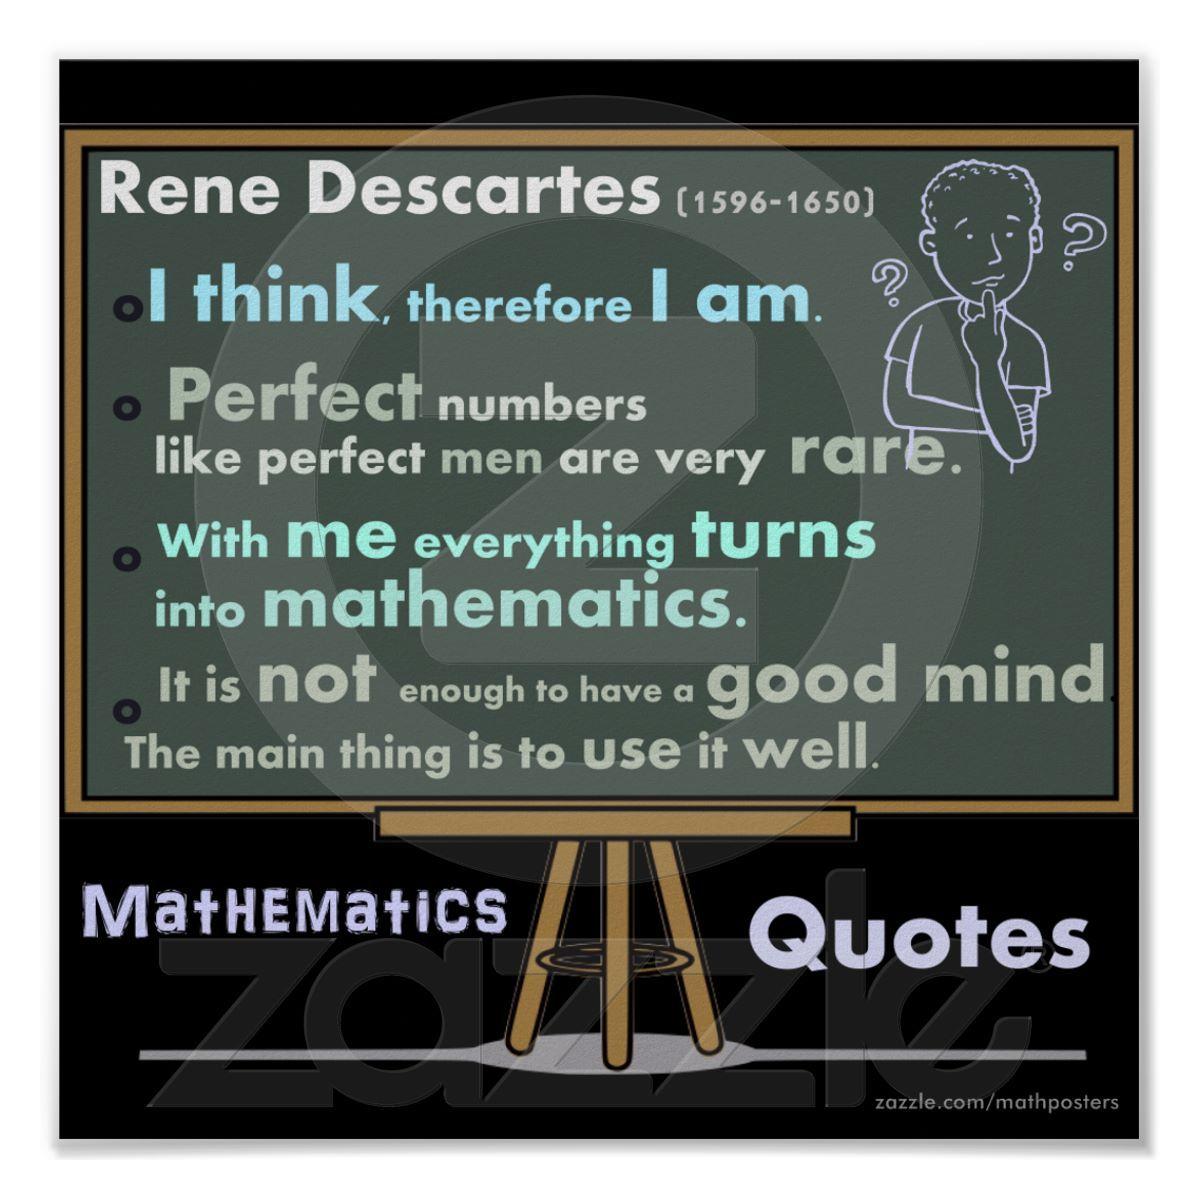 Rene Descartes Mathematics Posters Quotes from Zazzle.com ...